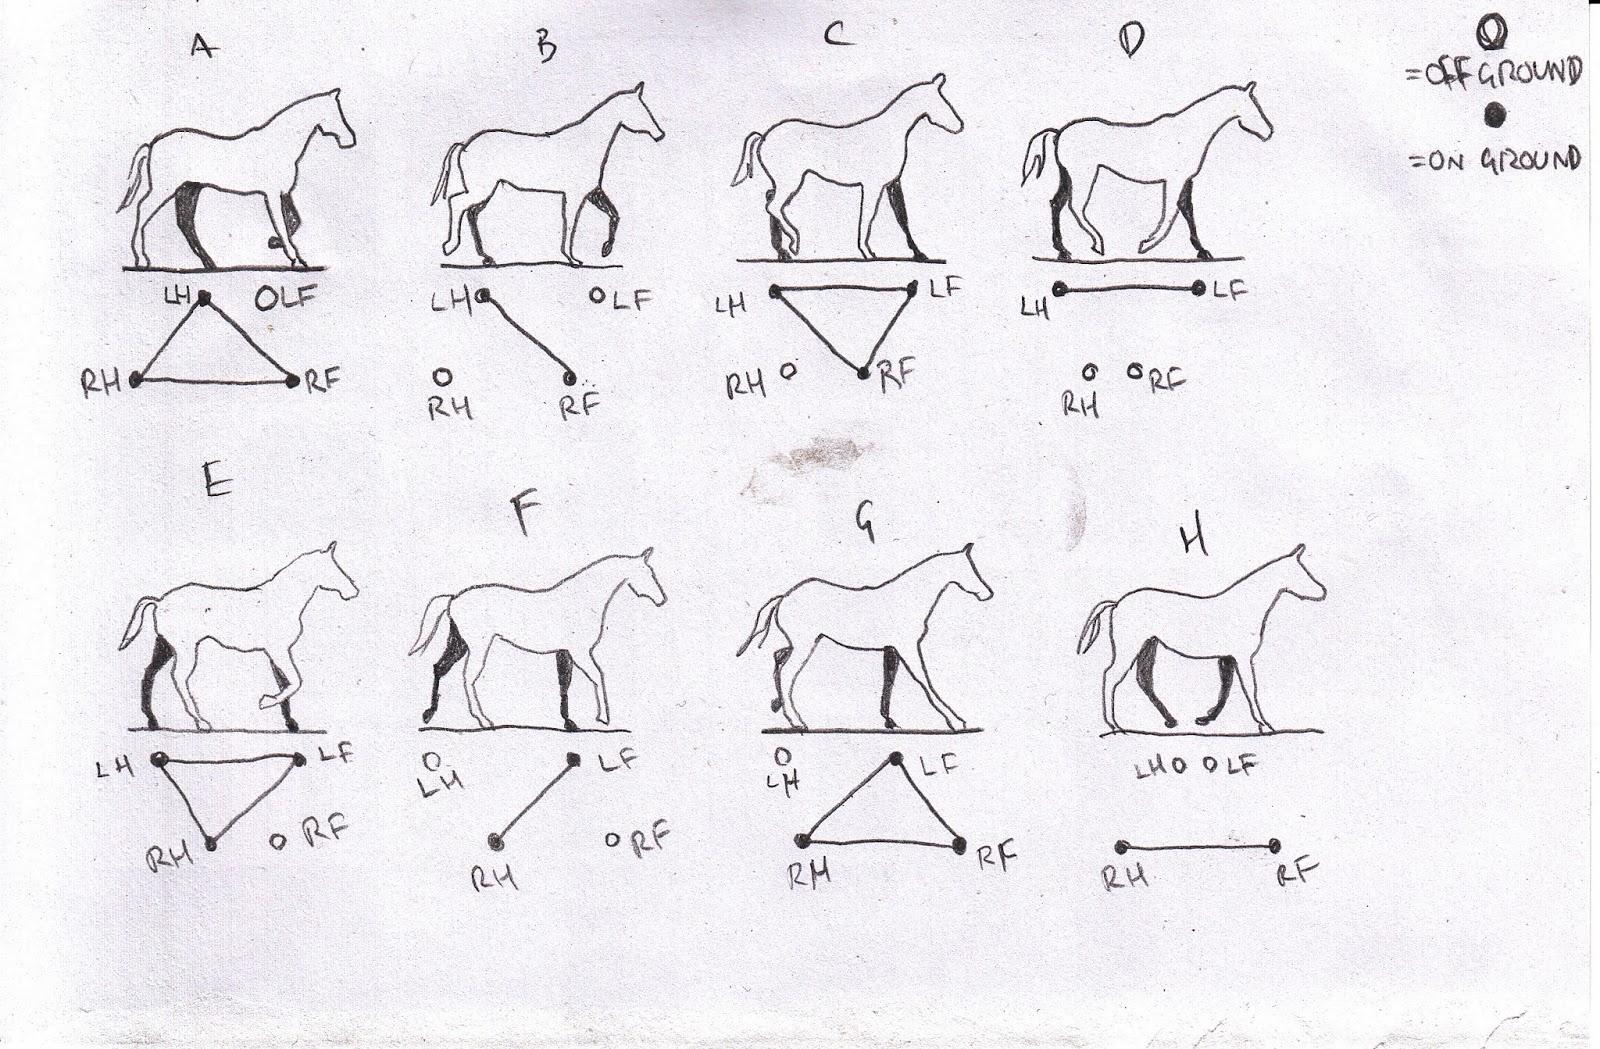 Horse Running Animation Frames - More information